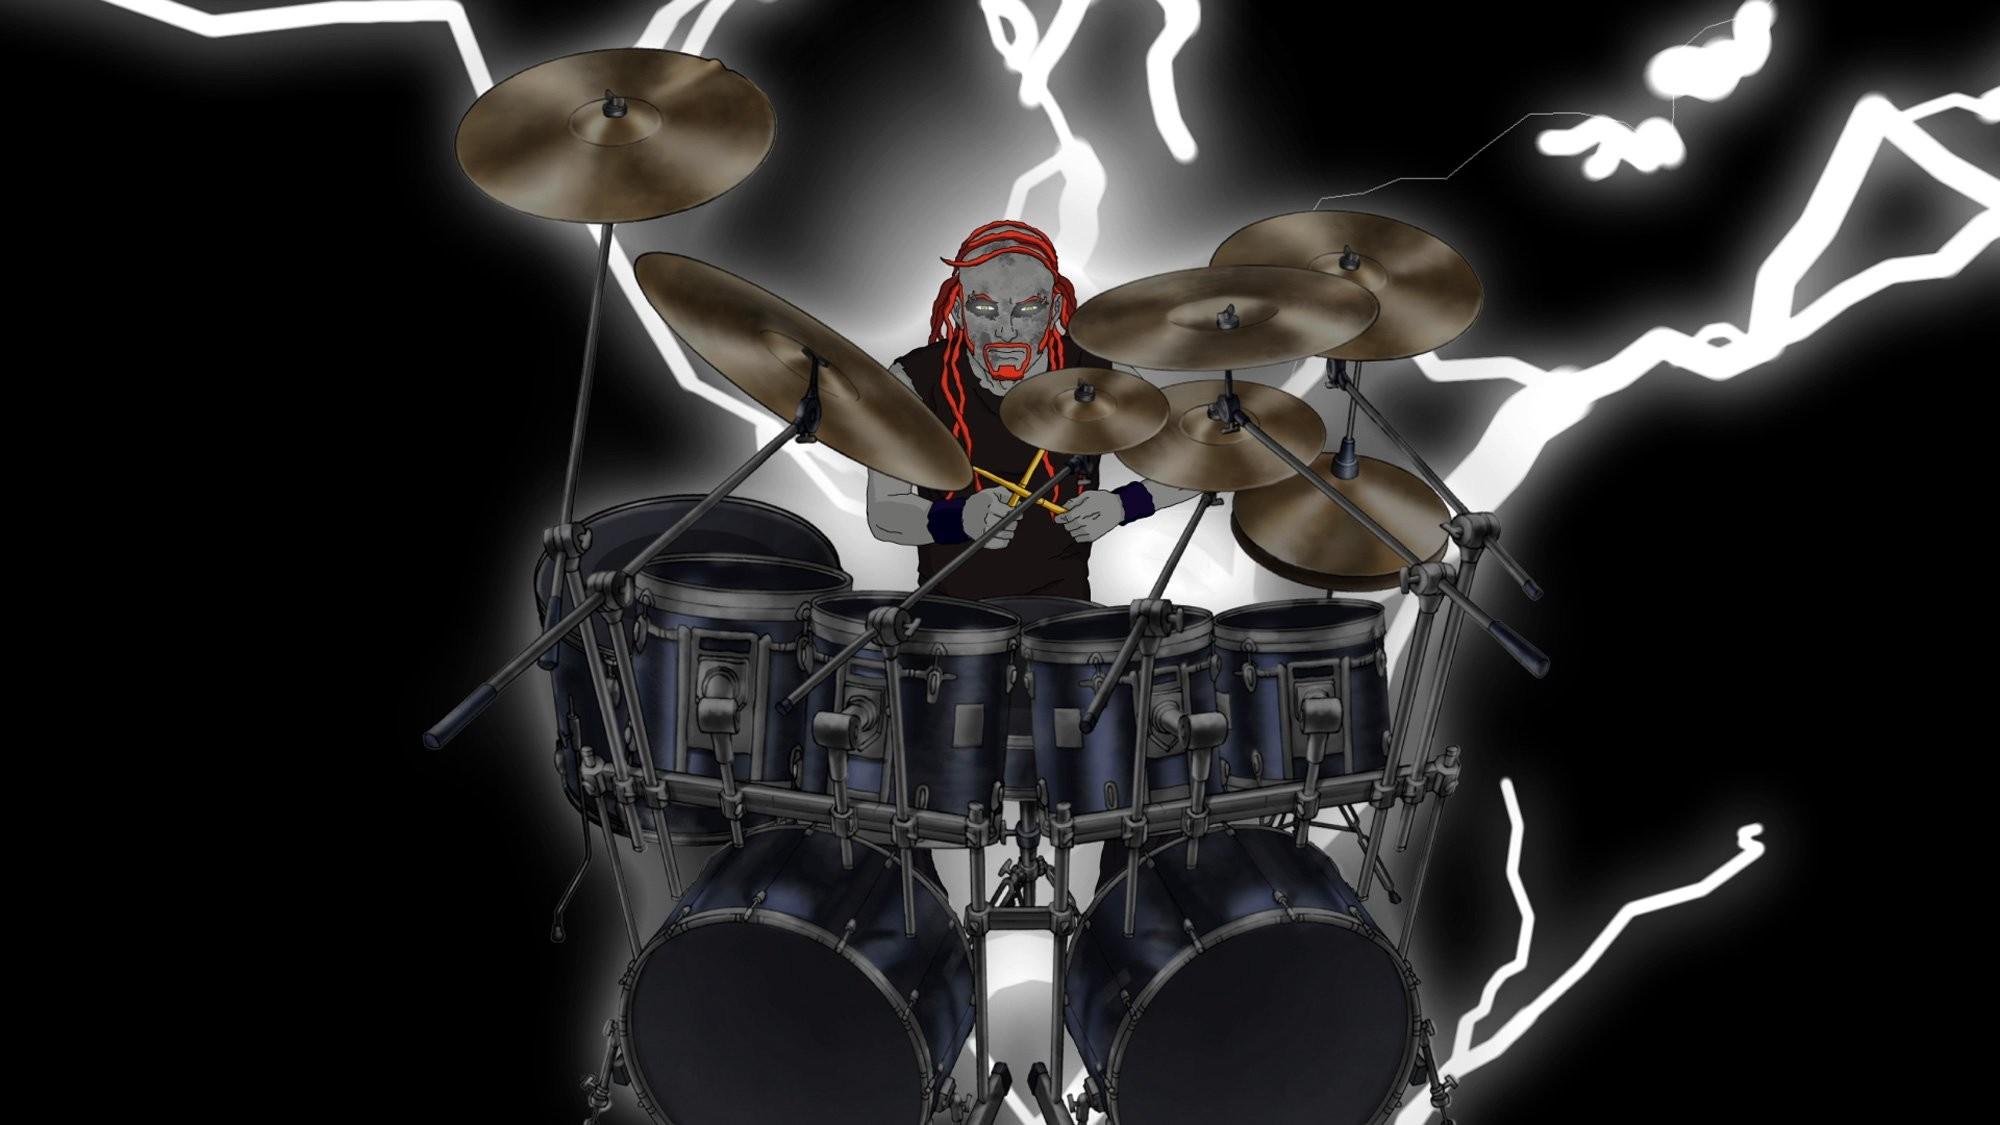 Rock Band Drummer Cartoon | … music cartoons hard rock band groups  metalocalypse drums